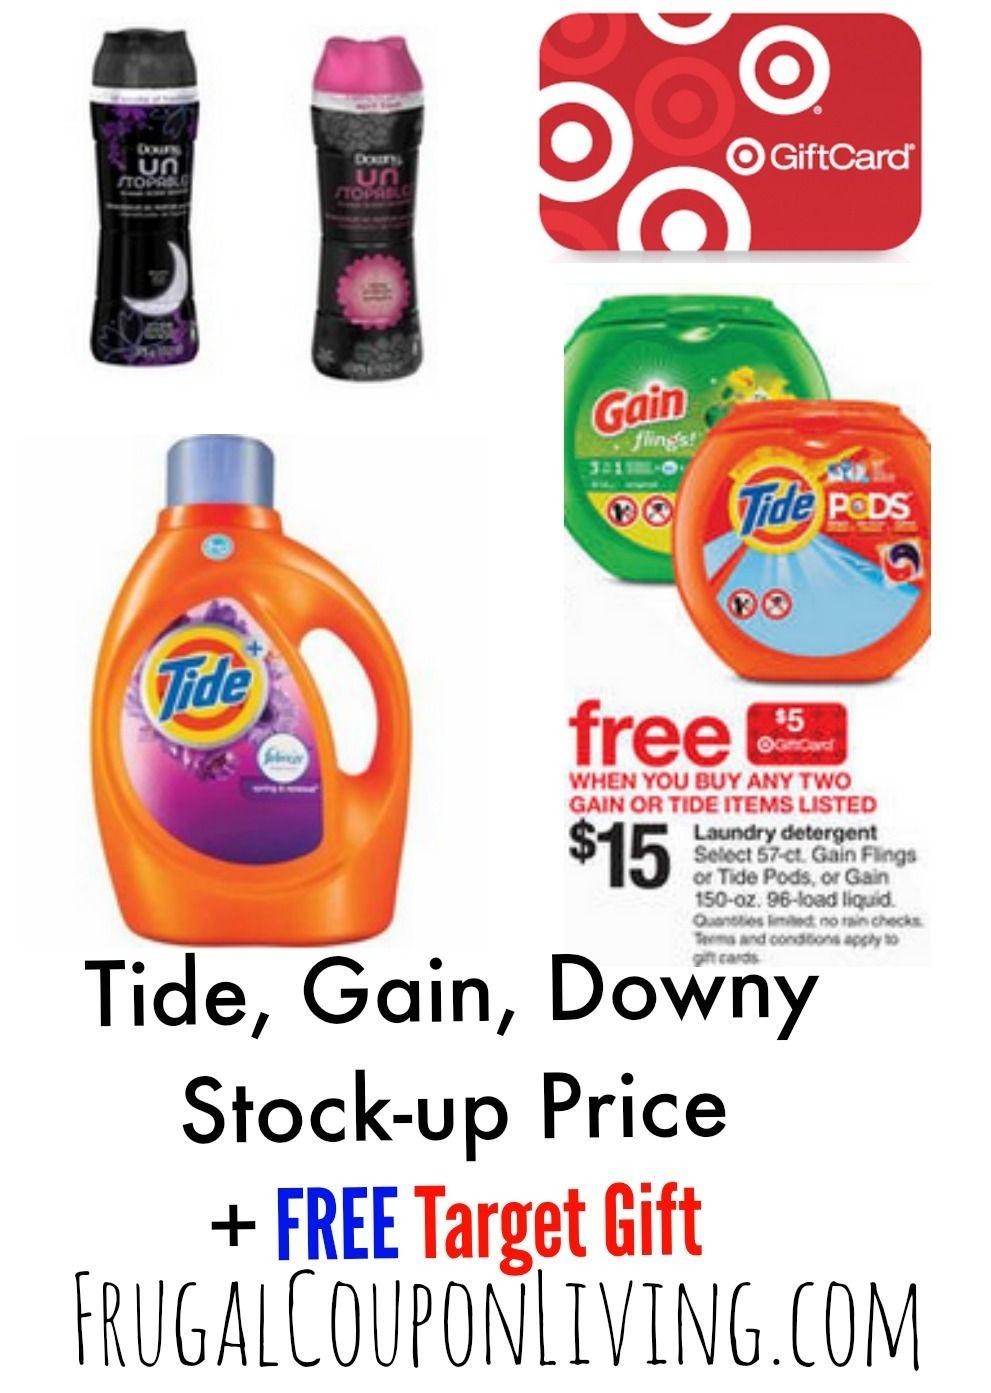 Target Laundry Detergent Deals + Tide & Downy Printable Coupons - Free Detergent Coupons Printable